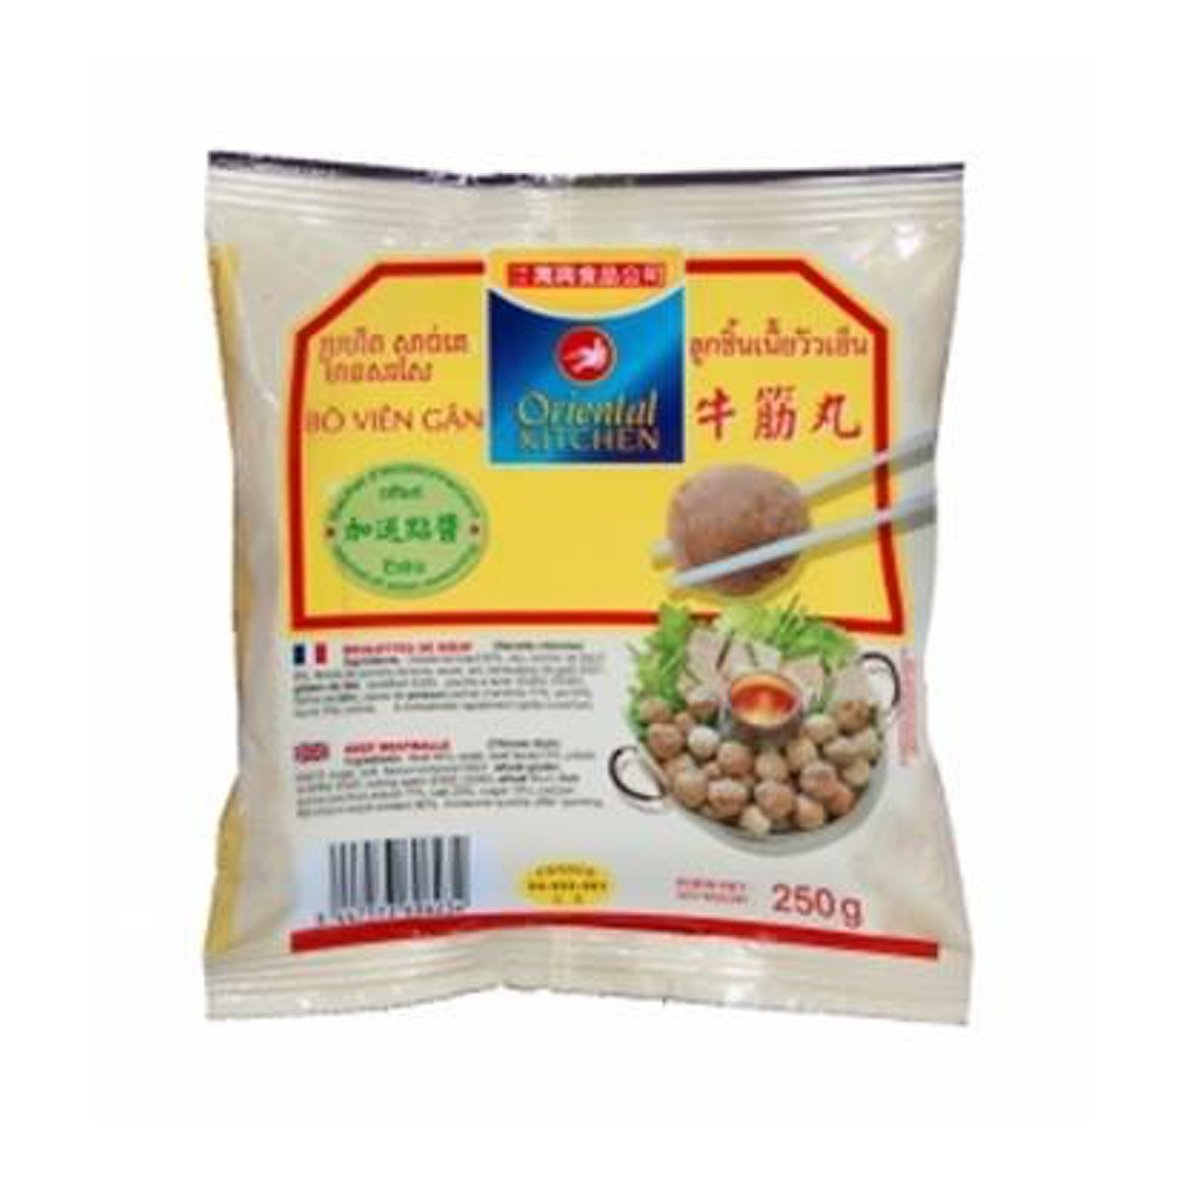 wx beef meatballs with nerve 250g / 萬興 凍牛筋丸 250克 - yamado